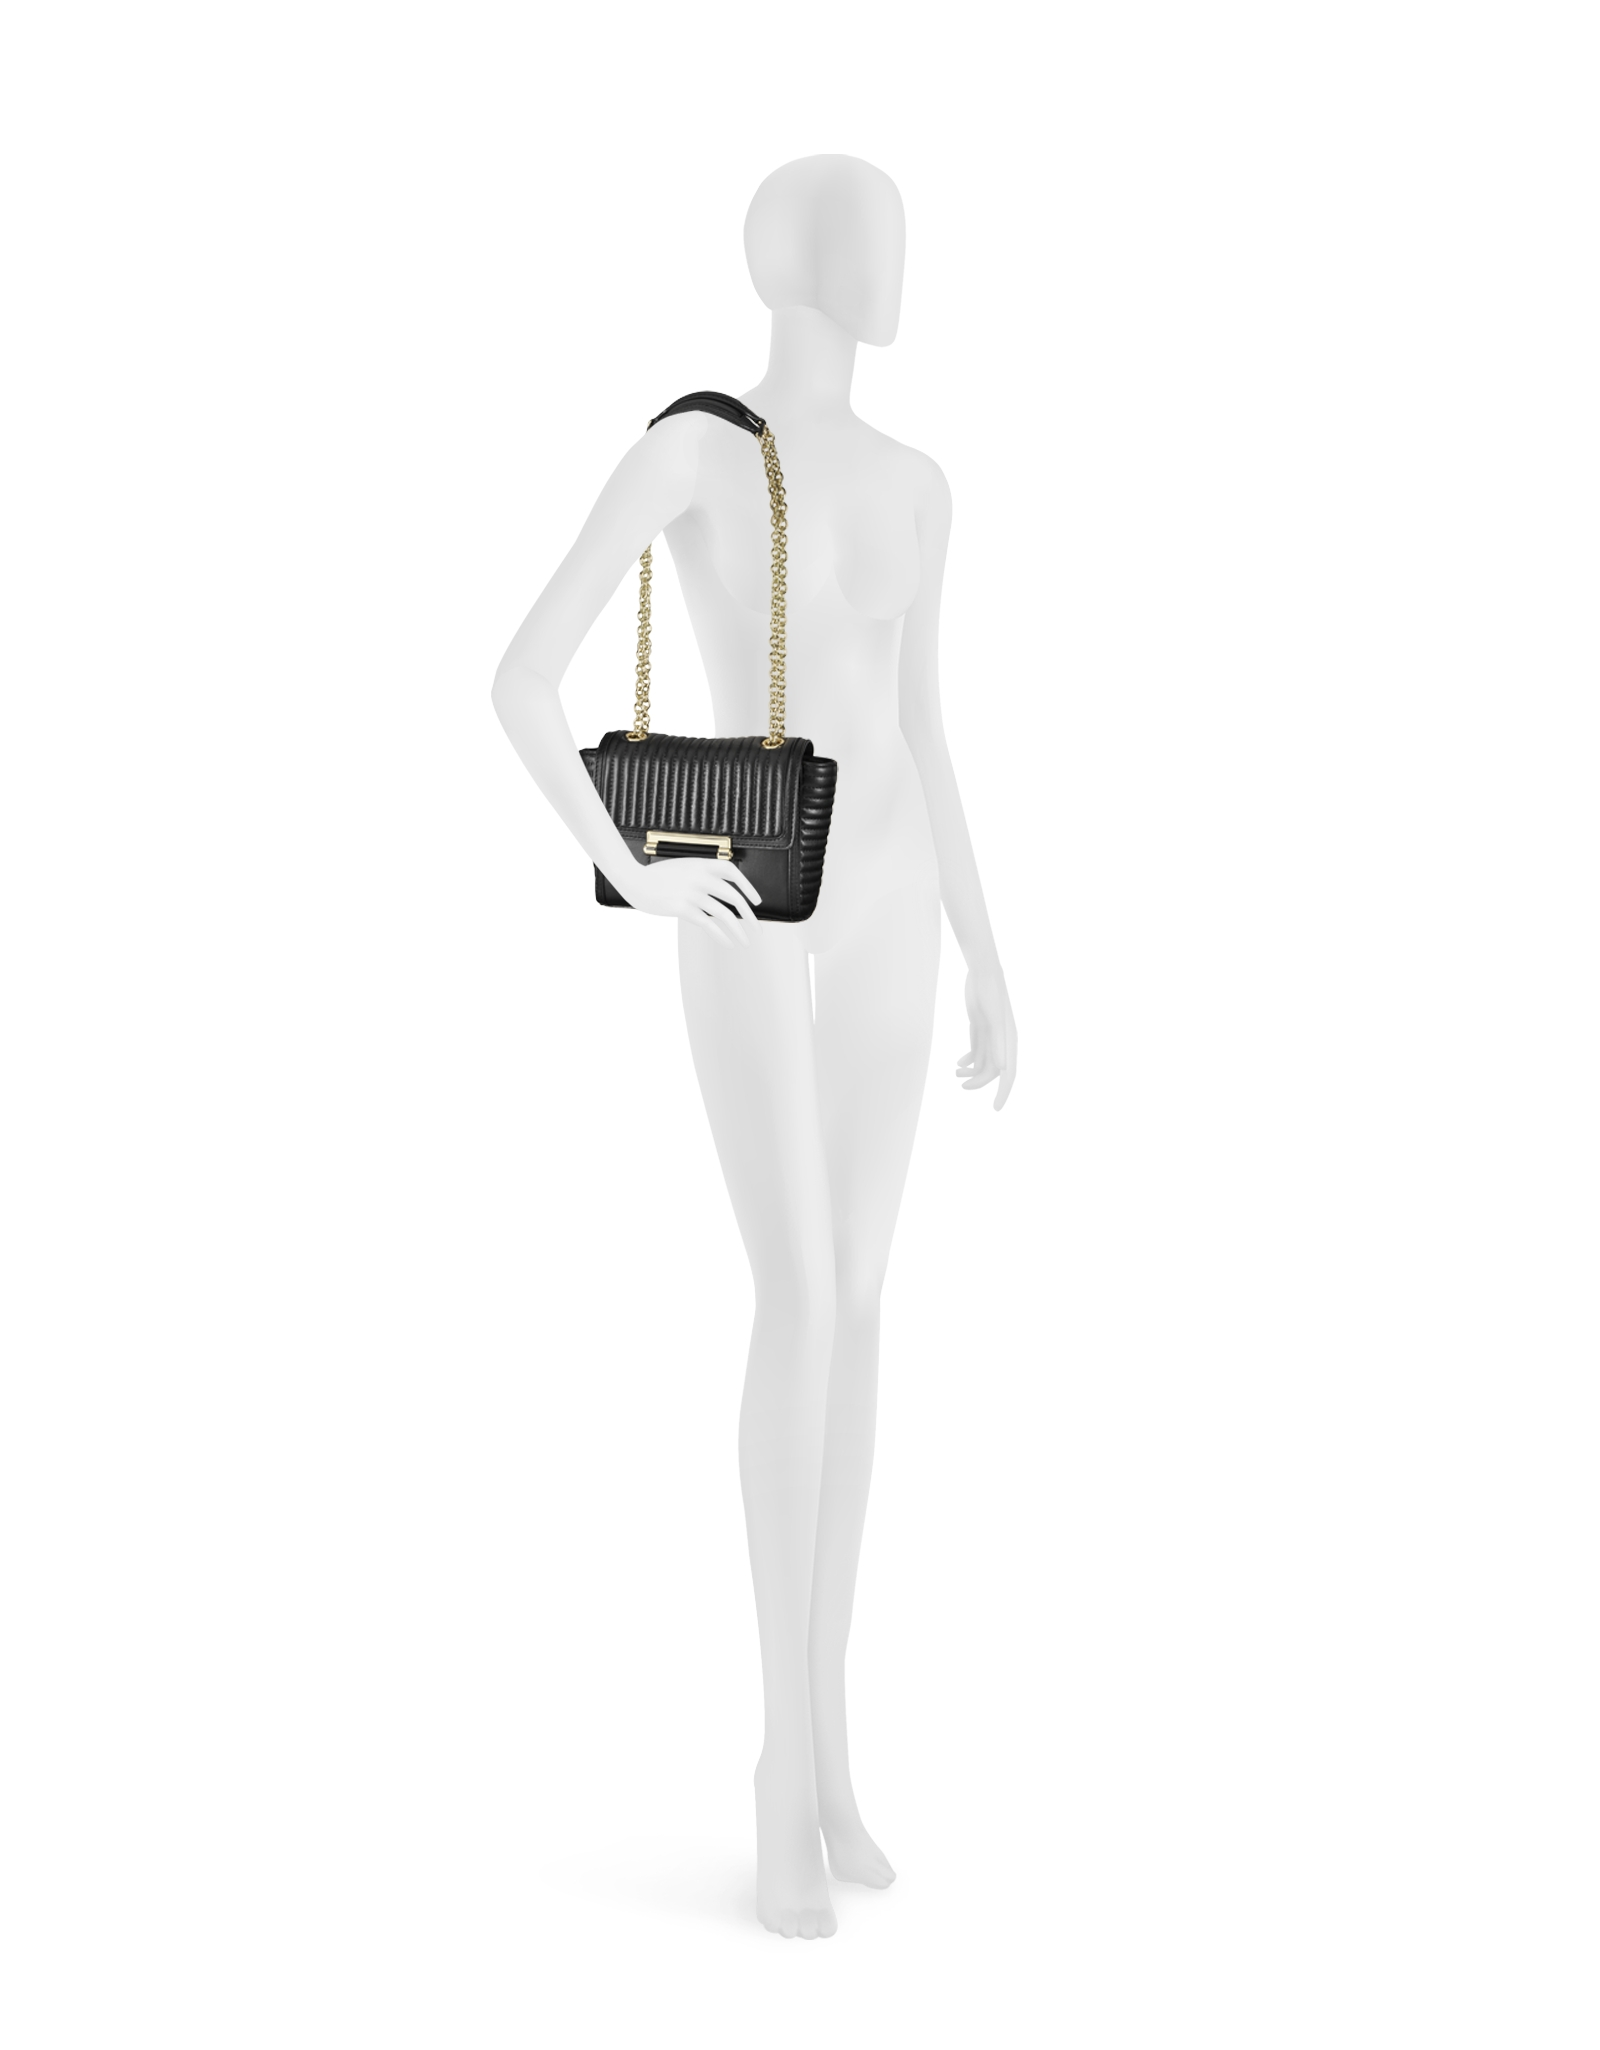 Diane von furstenberg 440 mini rail quilt black leather crossbody bag